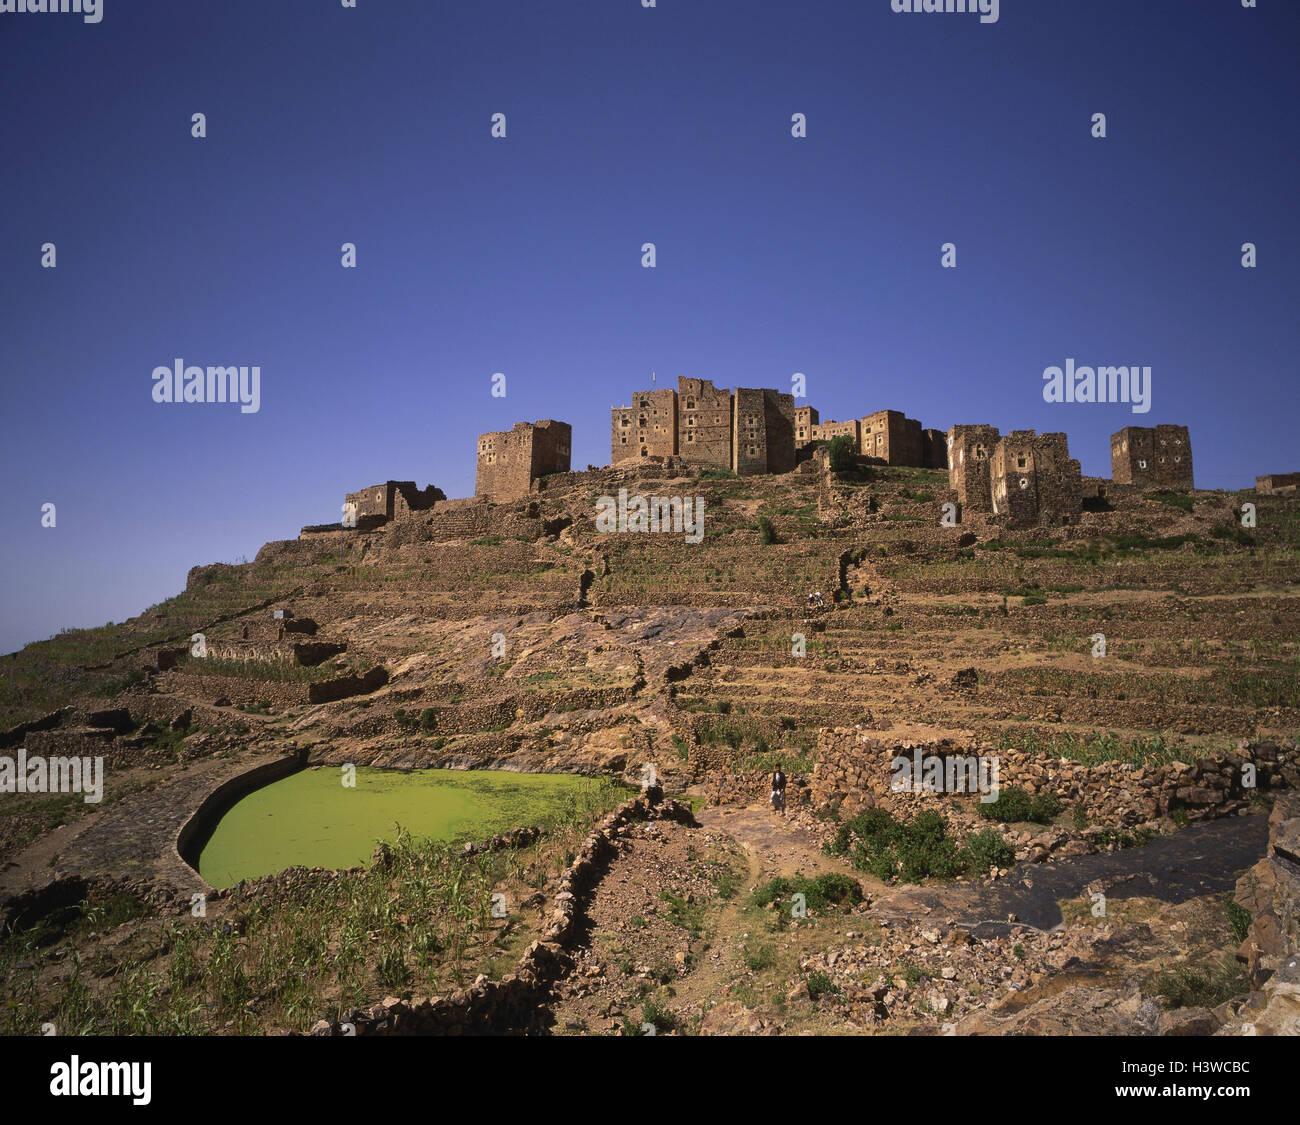 Yemen, mountain village, cistern, Arabia, peninsula, Sahara, sanctuary, village, castle, entries in accordance with. - Stock Image